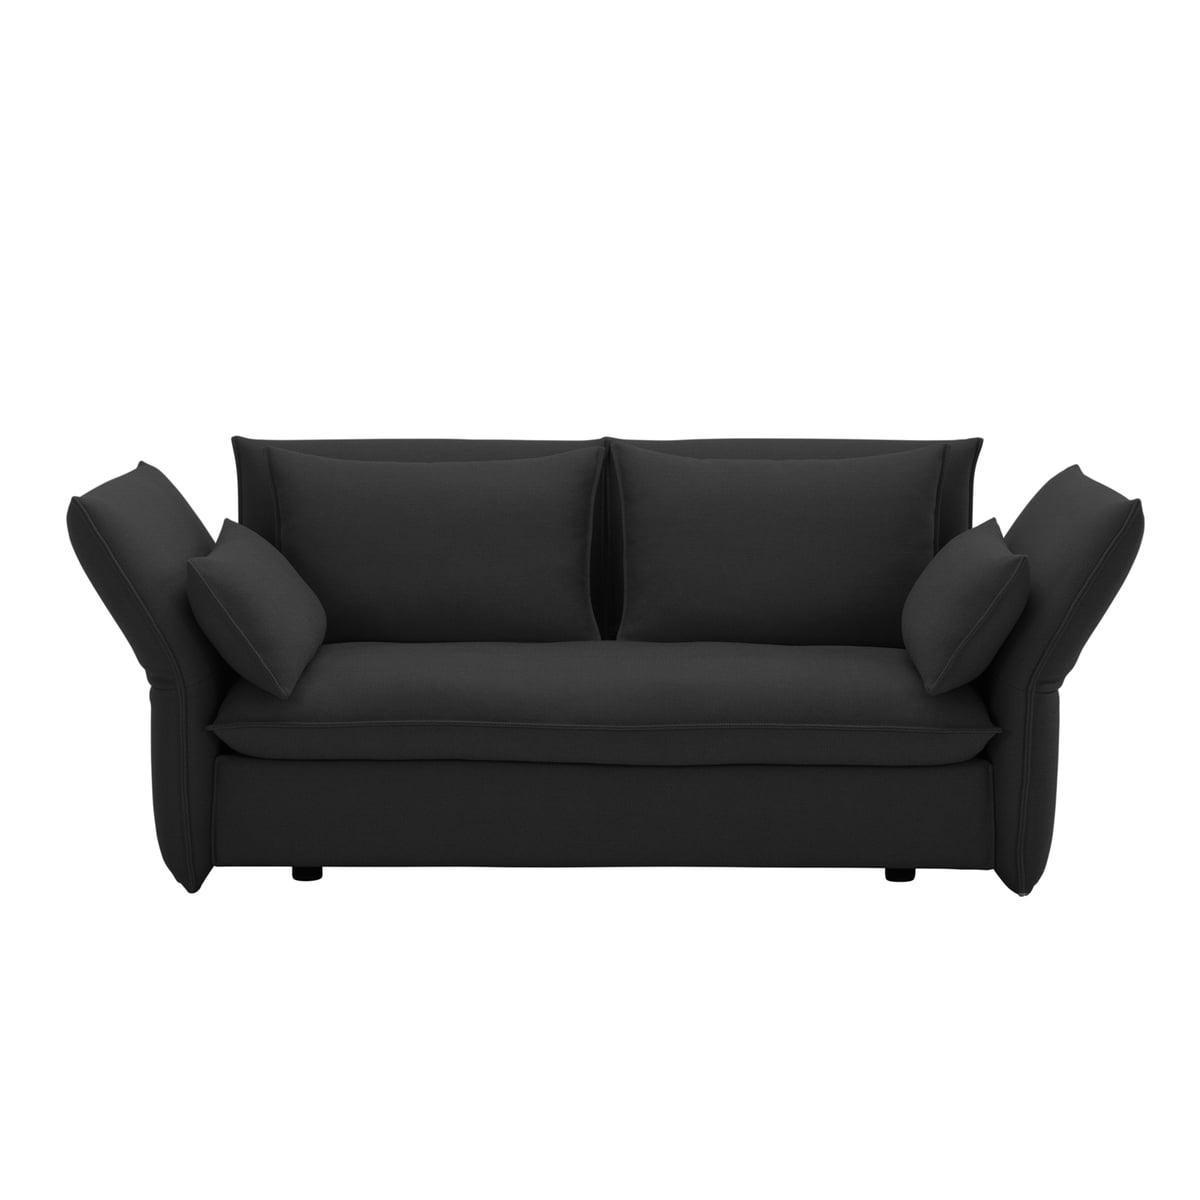 mariposa sofa 2 5 sitzer von vitra im shop. Black Bedroom Furniture Sets. Home Design Ideas